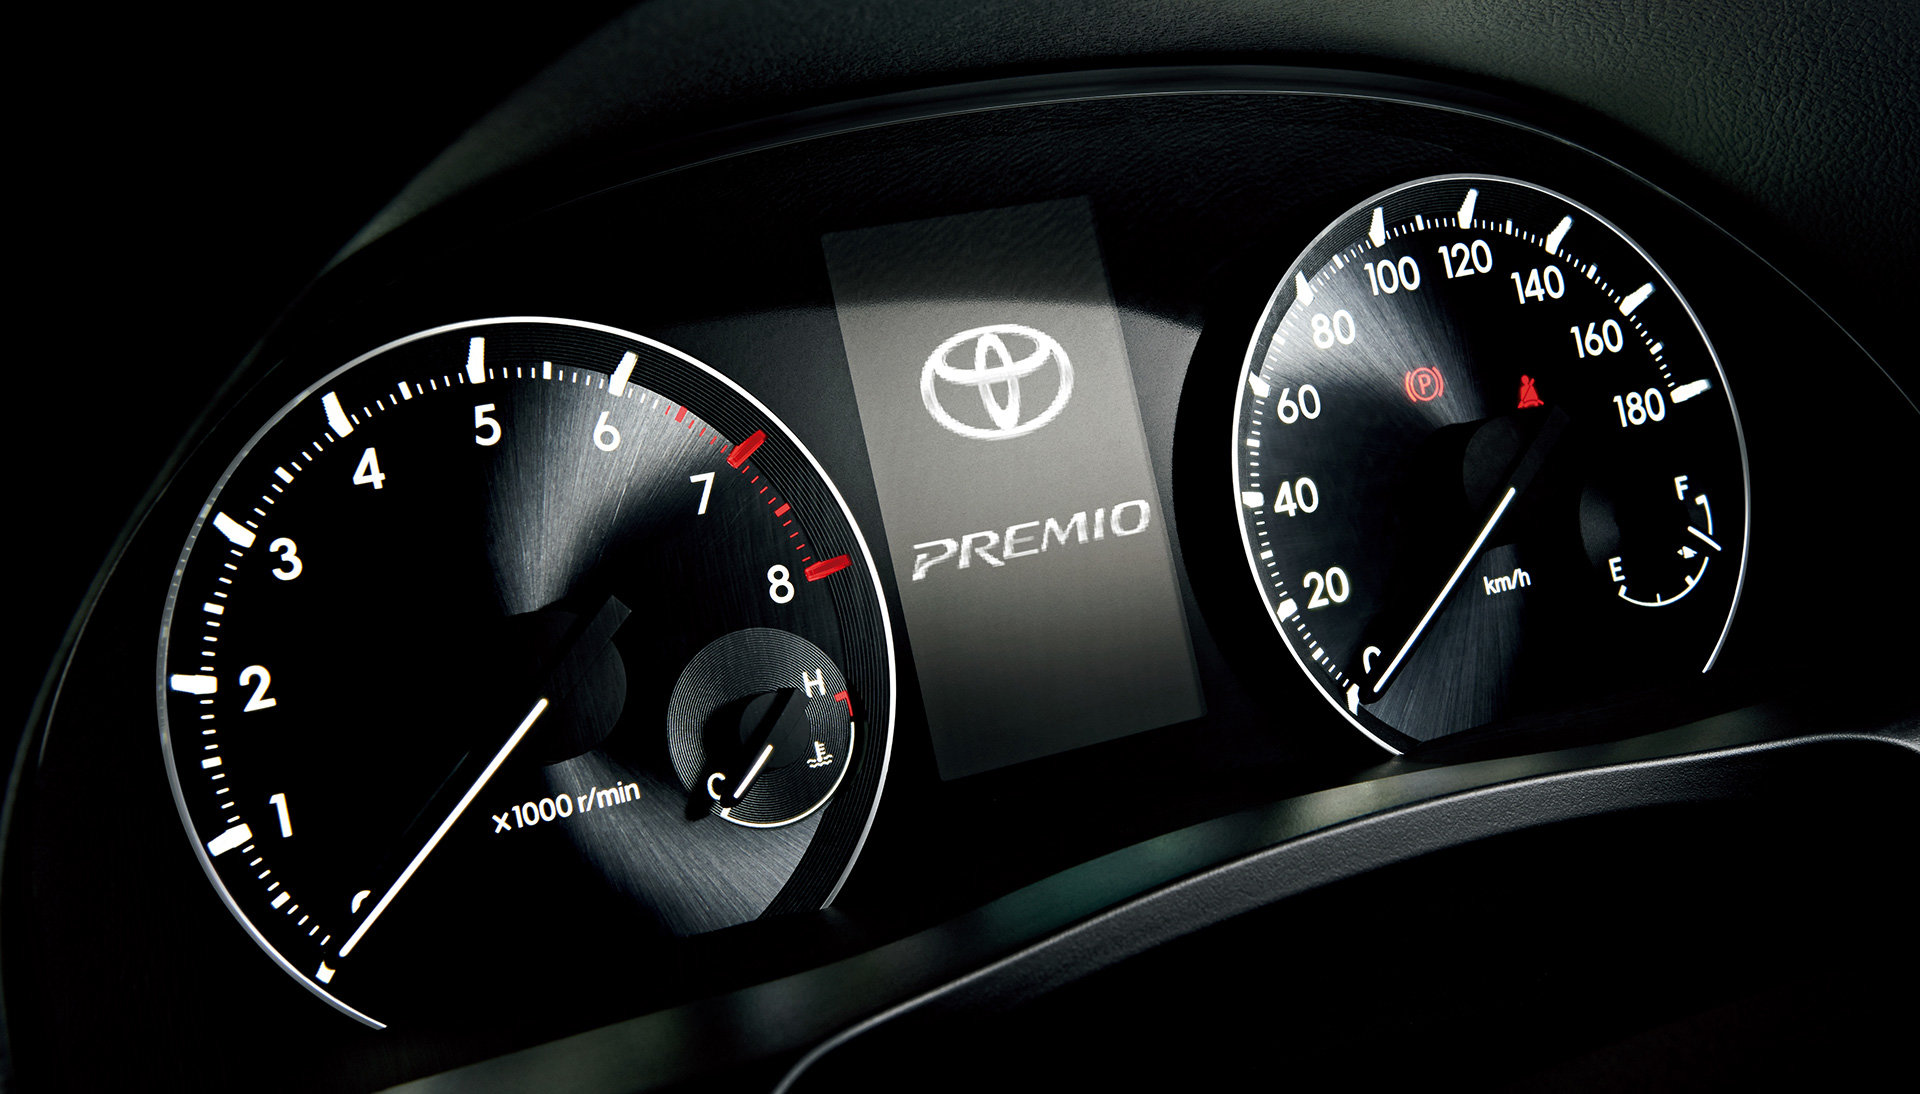 панель приборов Toyota Корона премио #11